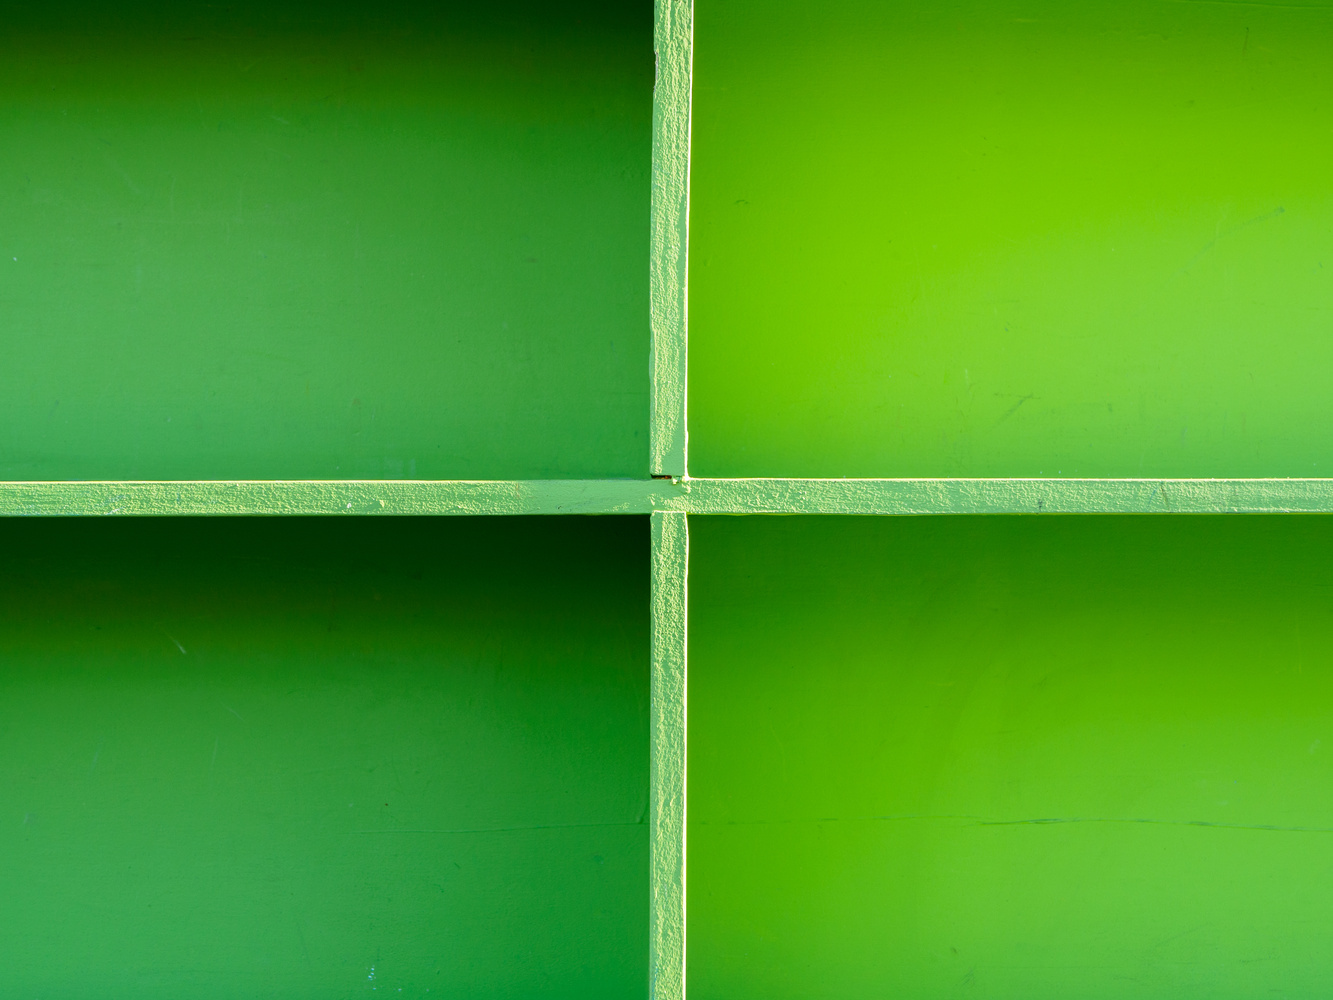 Bookshelf full of gradients by Ryan Giglio